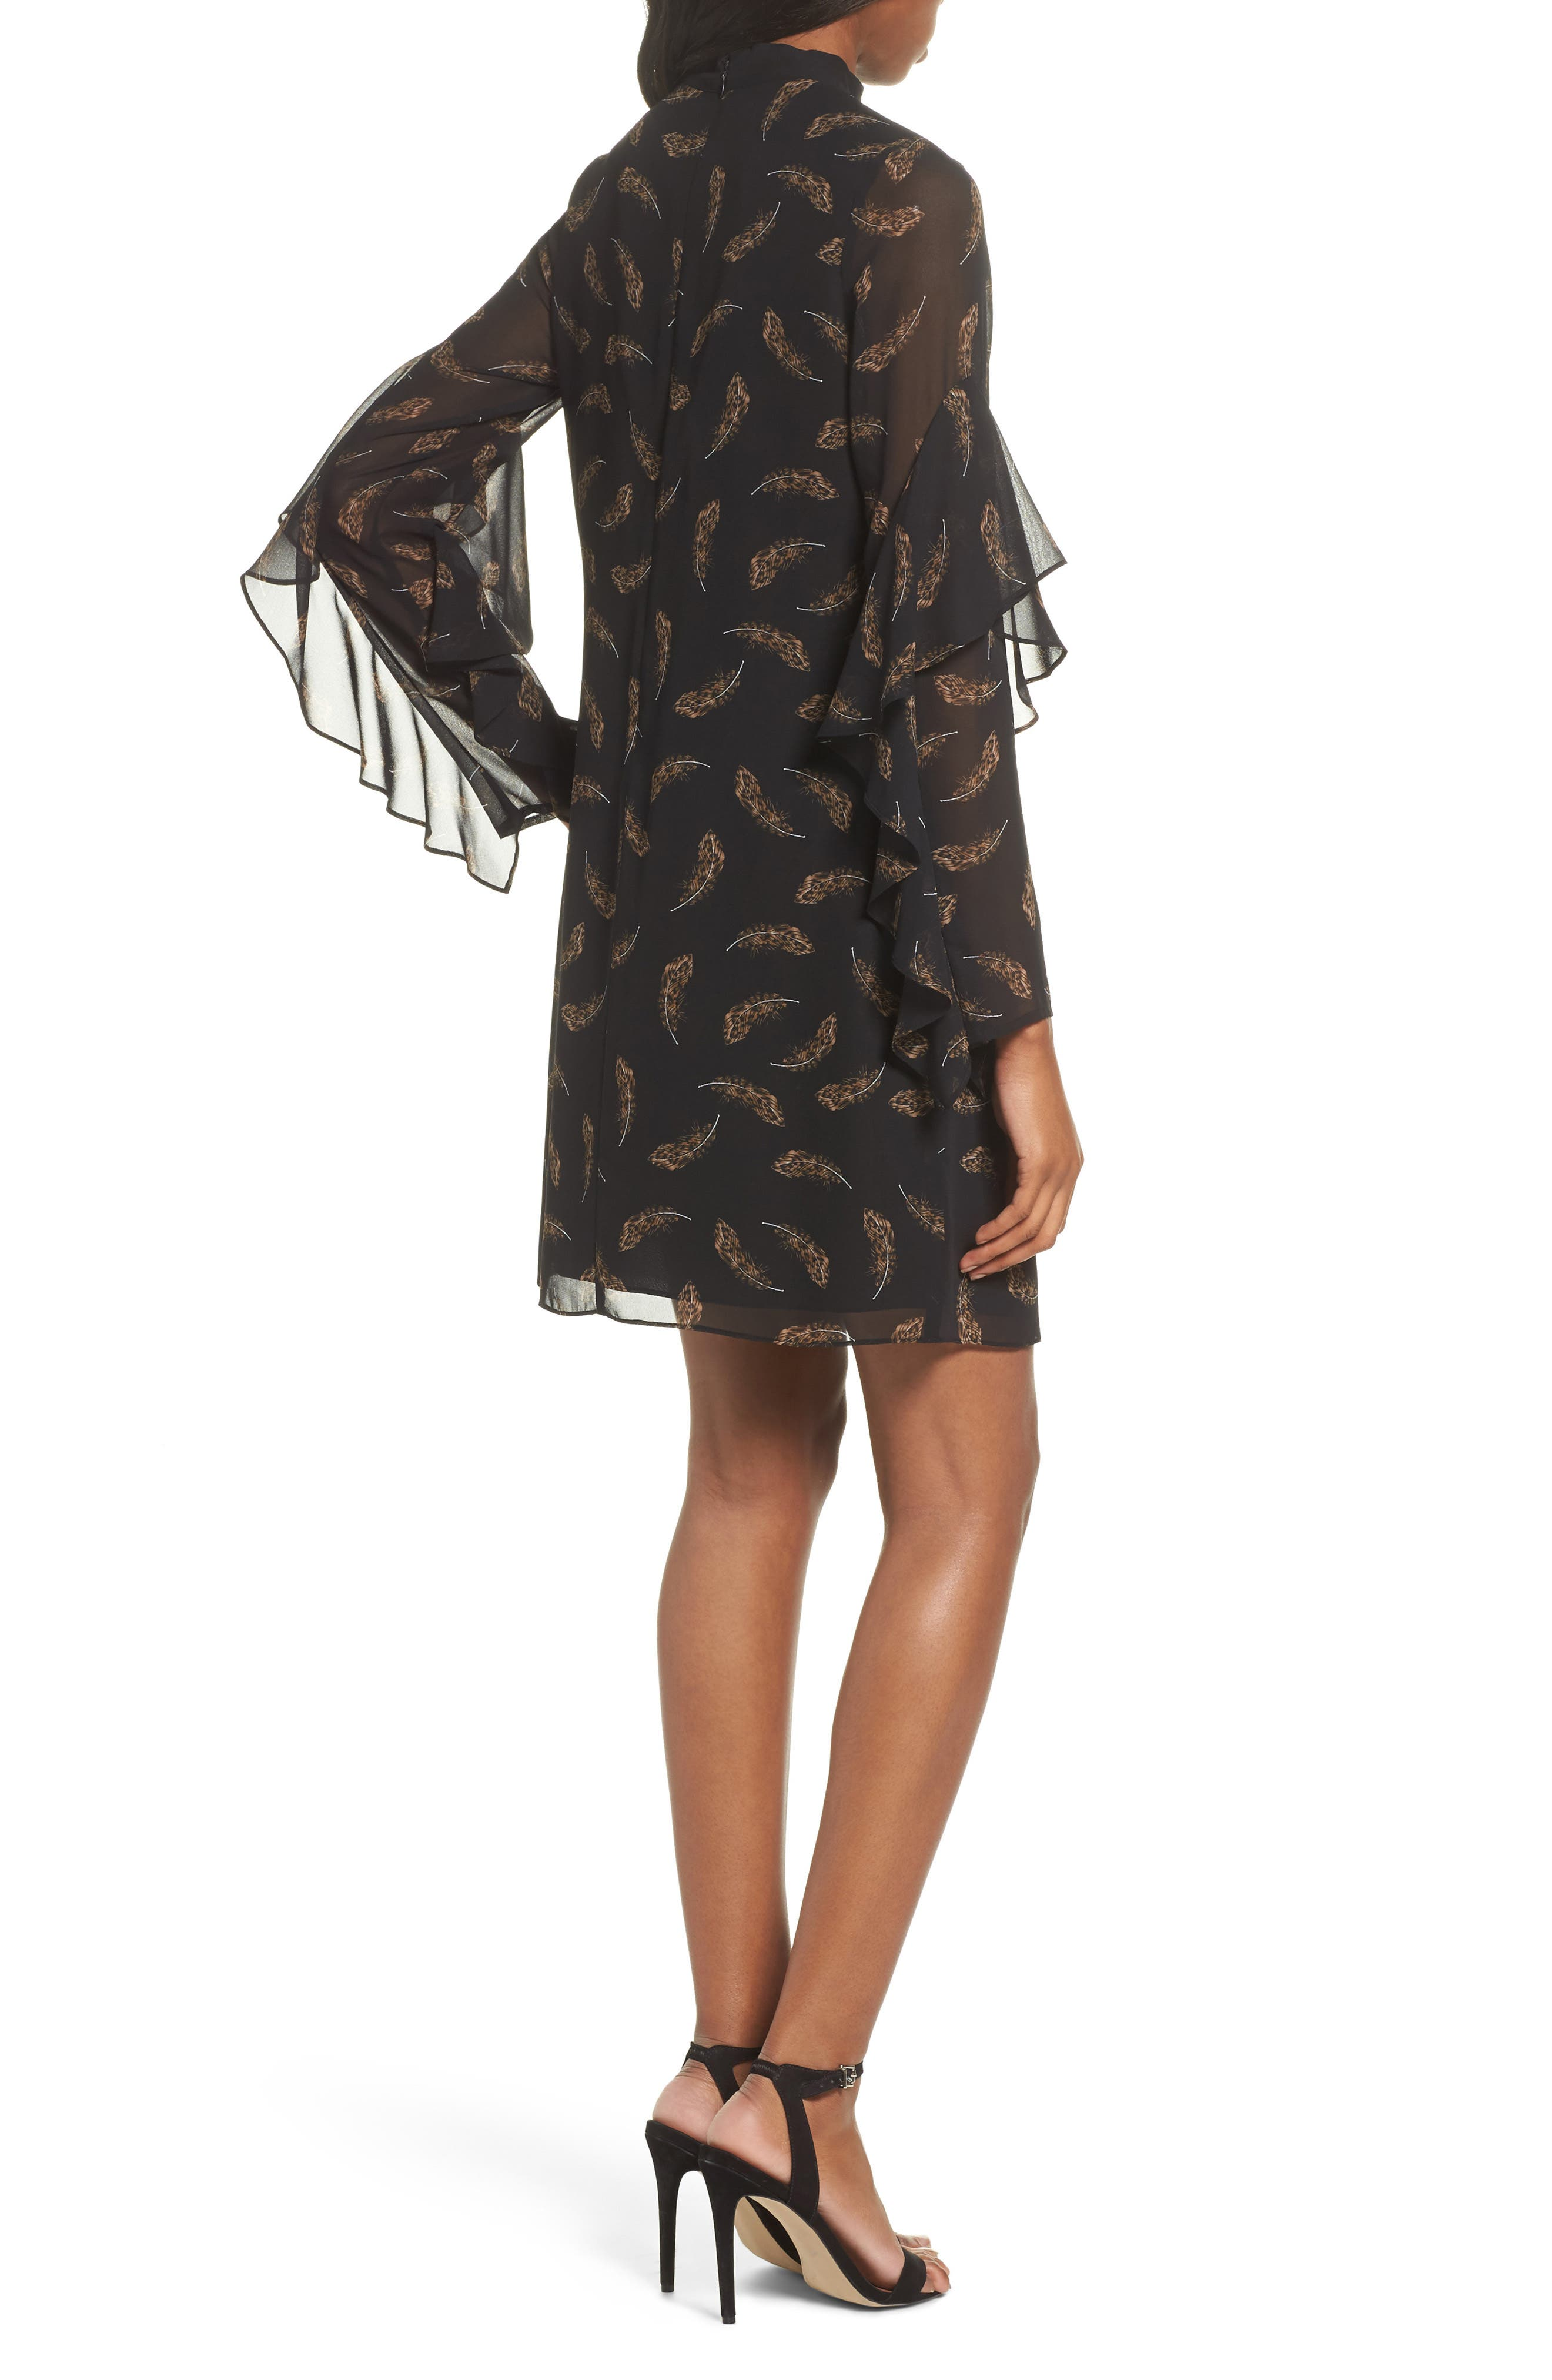 Feather Print Choker Collar Dress,                             Alternate thumbnail 2, color,                             Leopard Feather